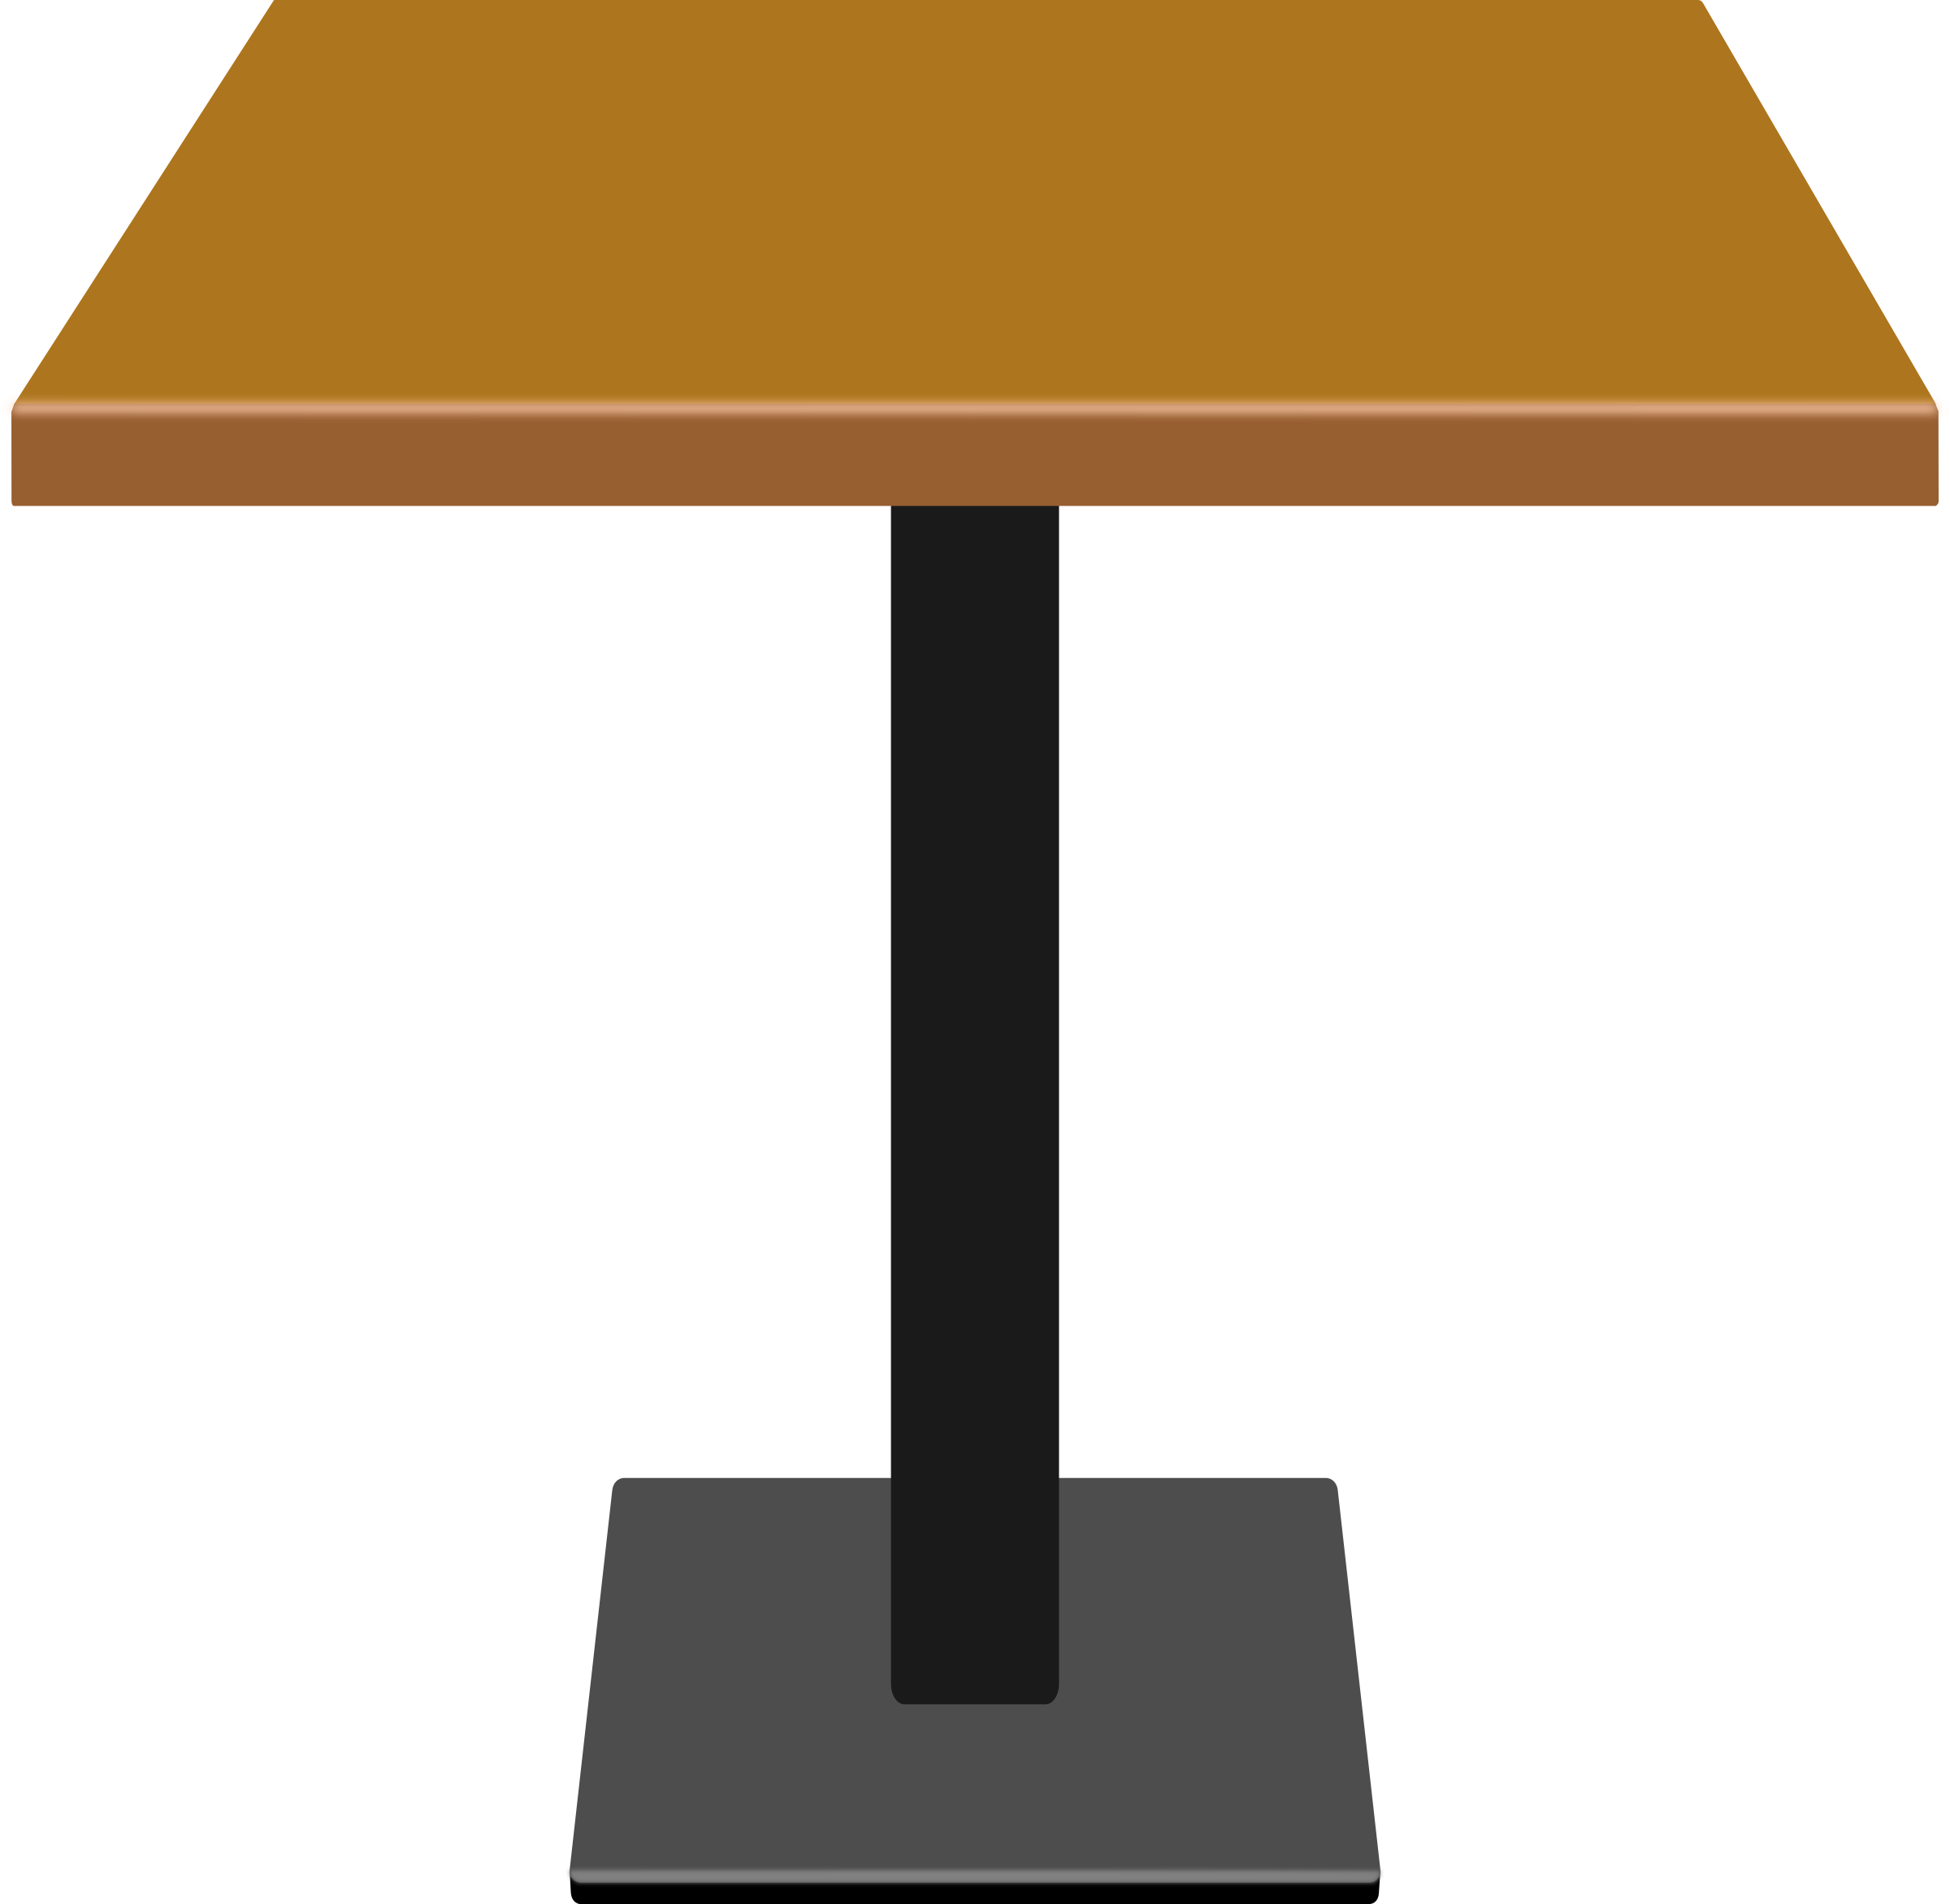 Terrific Table Cartoon Clipart Free Download Best Table Cartoon Interior Design Ideas Helimdqseriescom